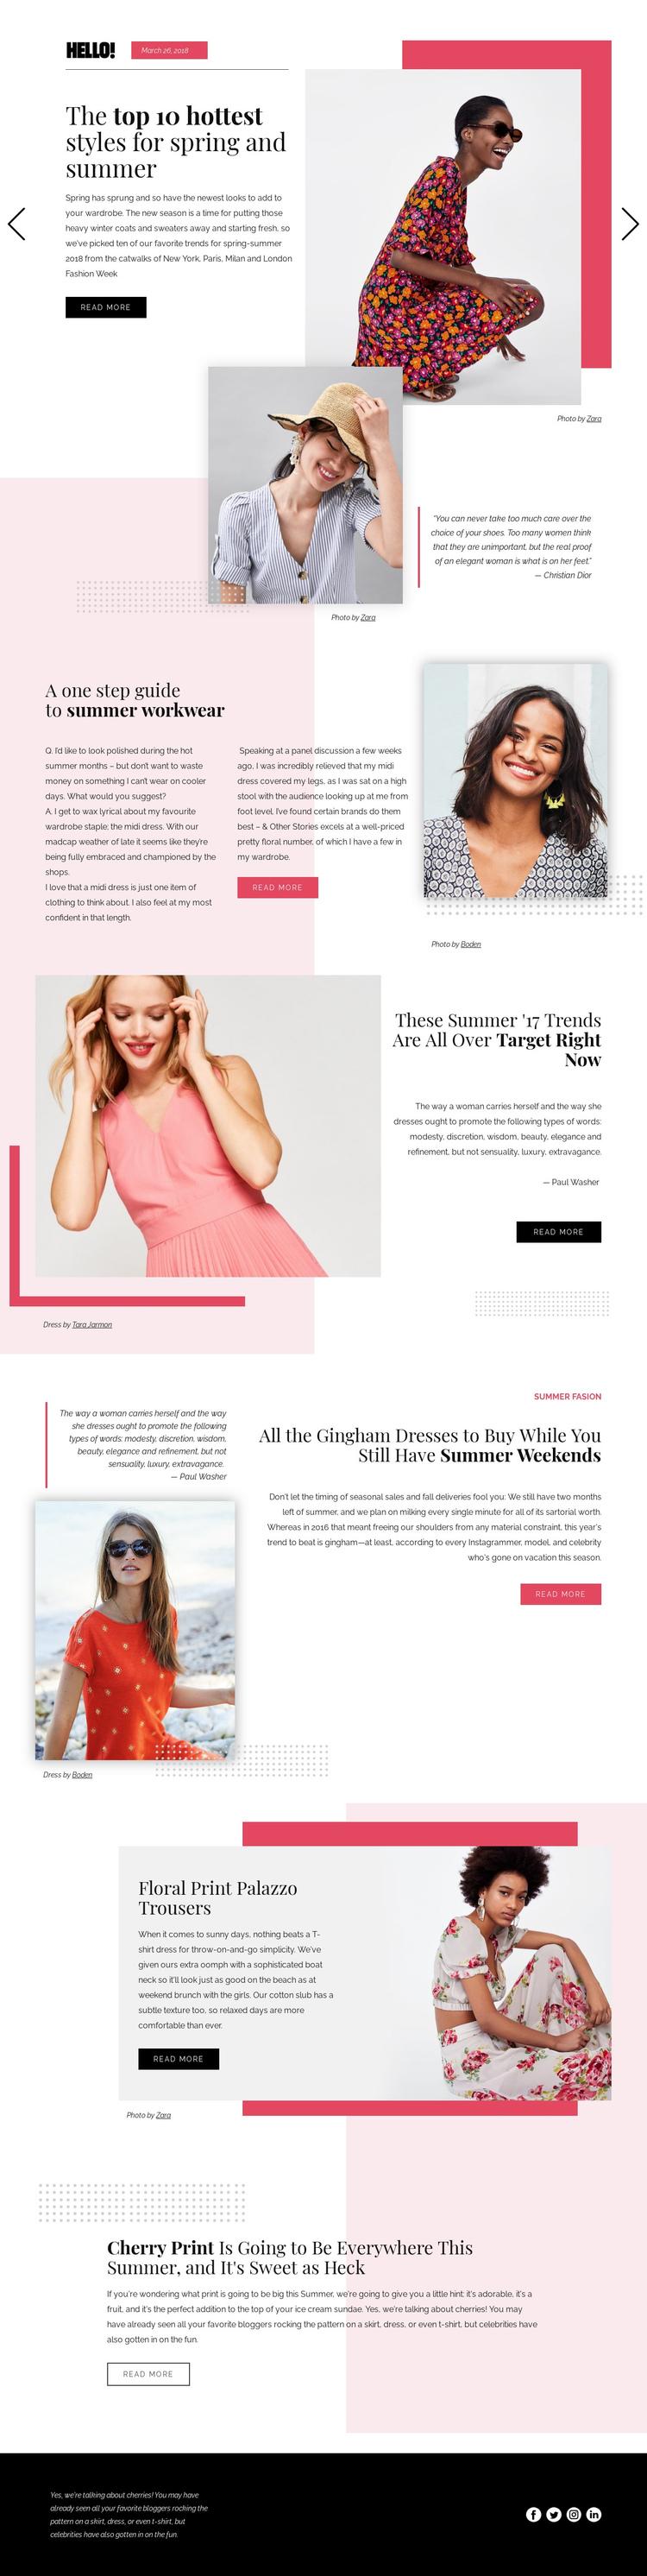 Fashion Trends Website Builder Software